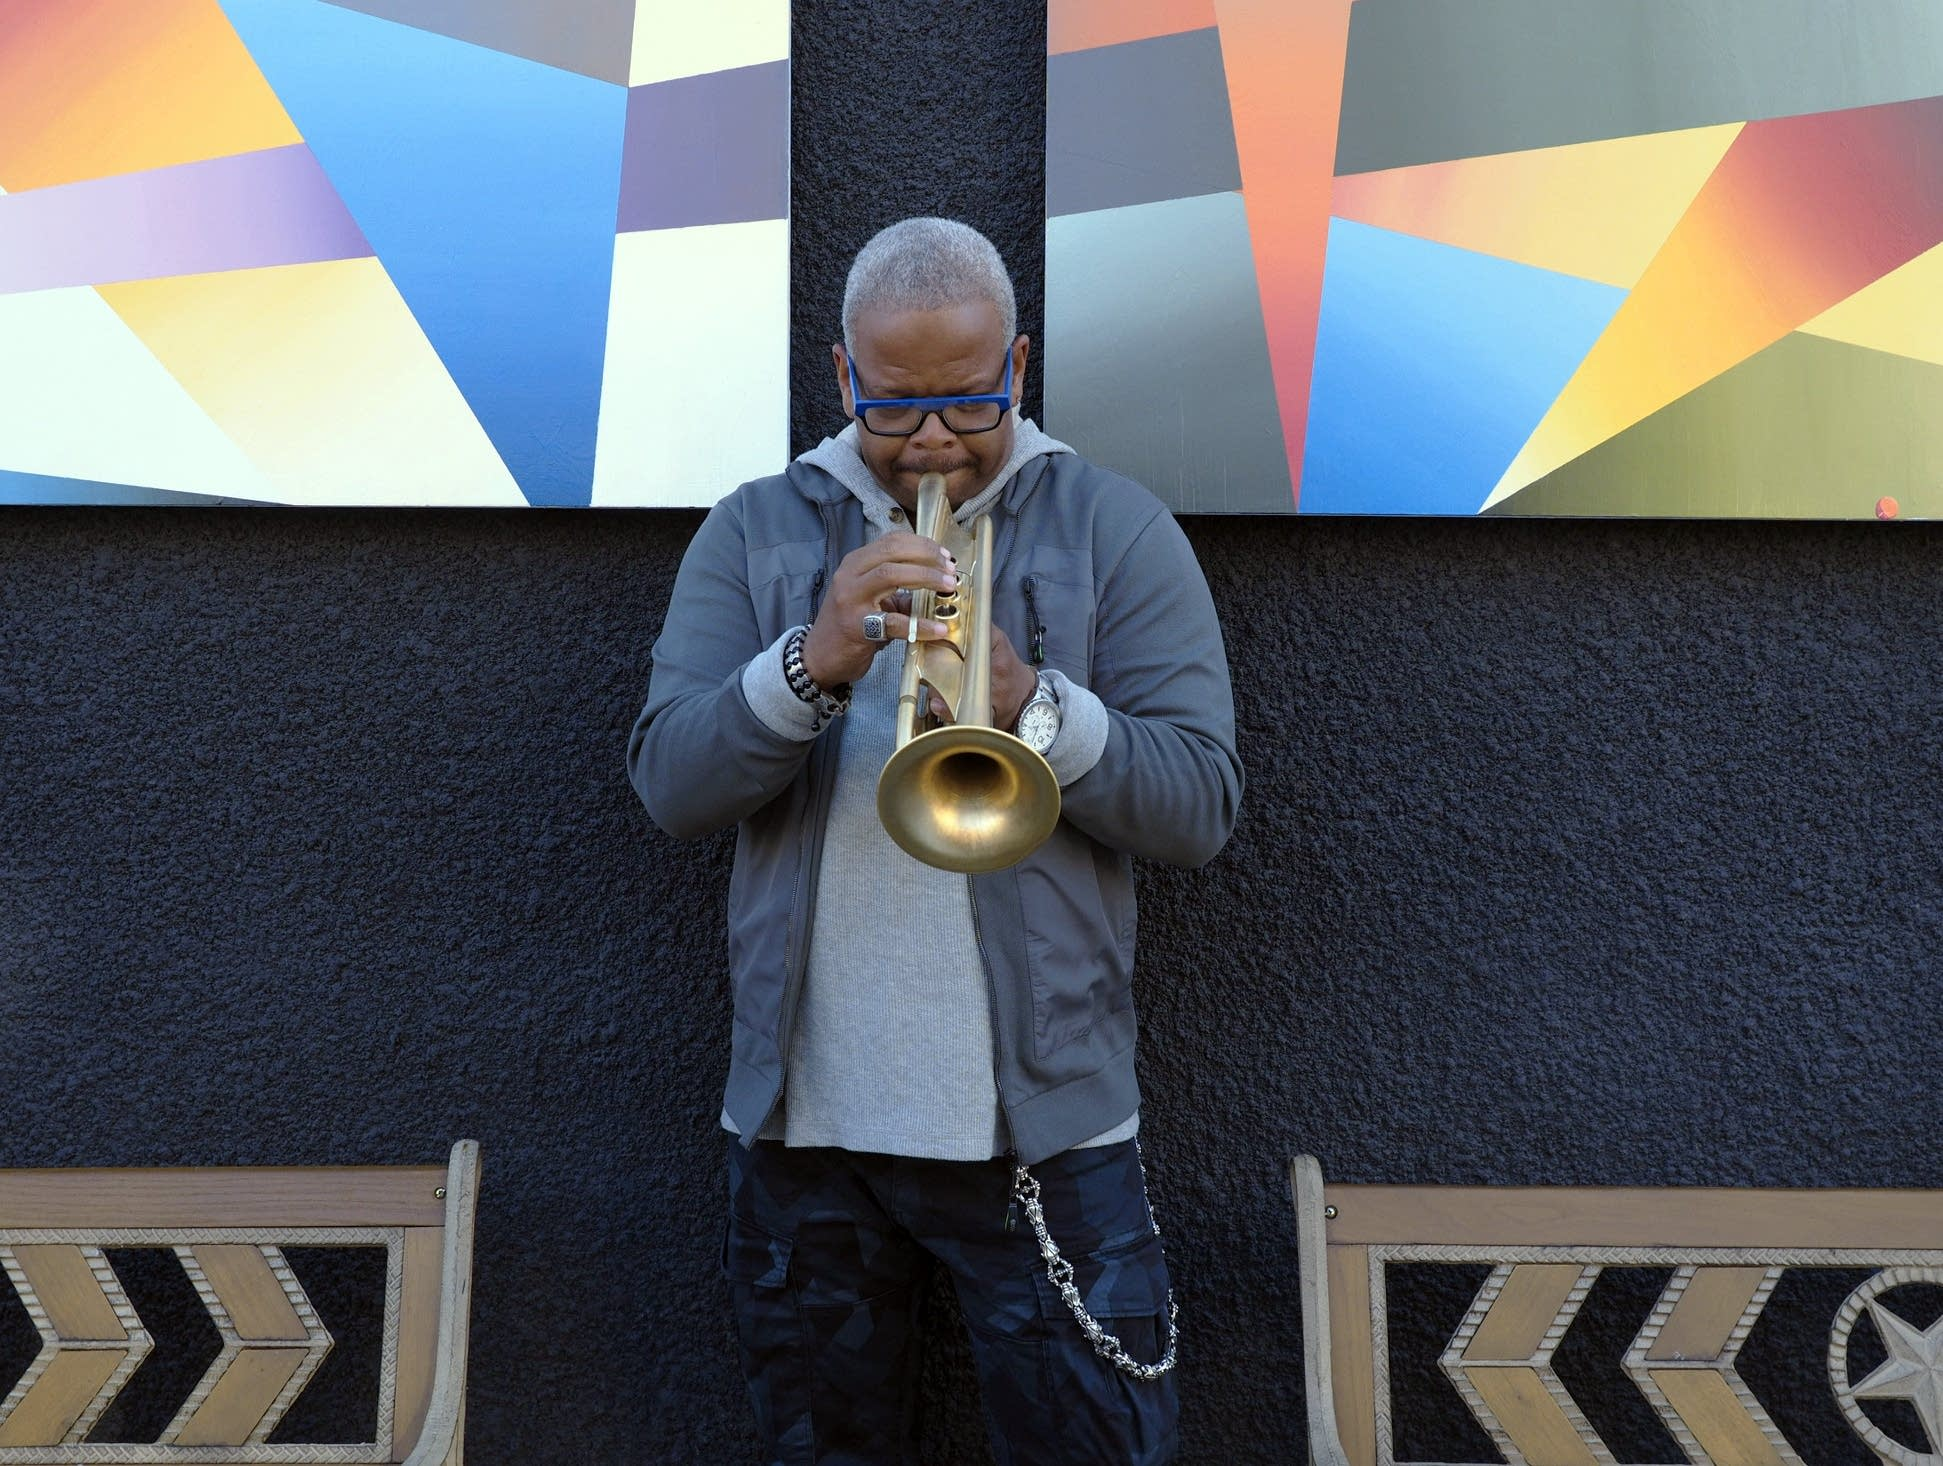 Jazz trumpeter Terence Blanchard